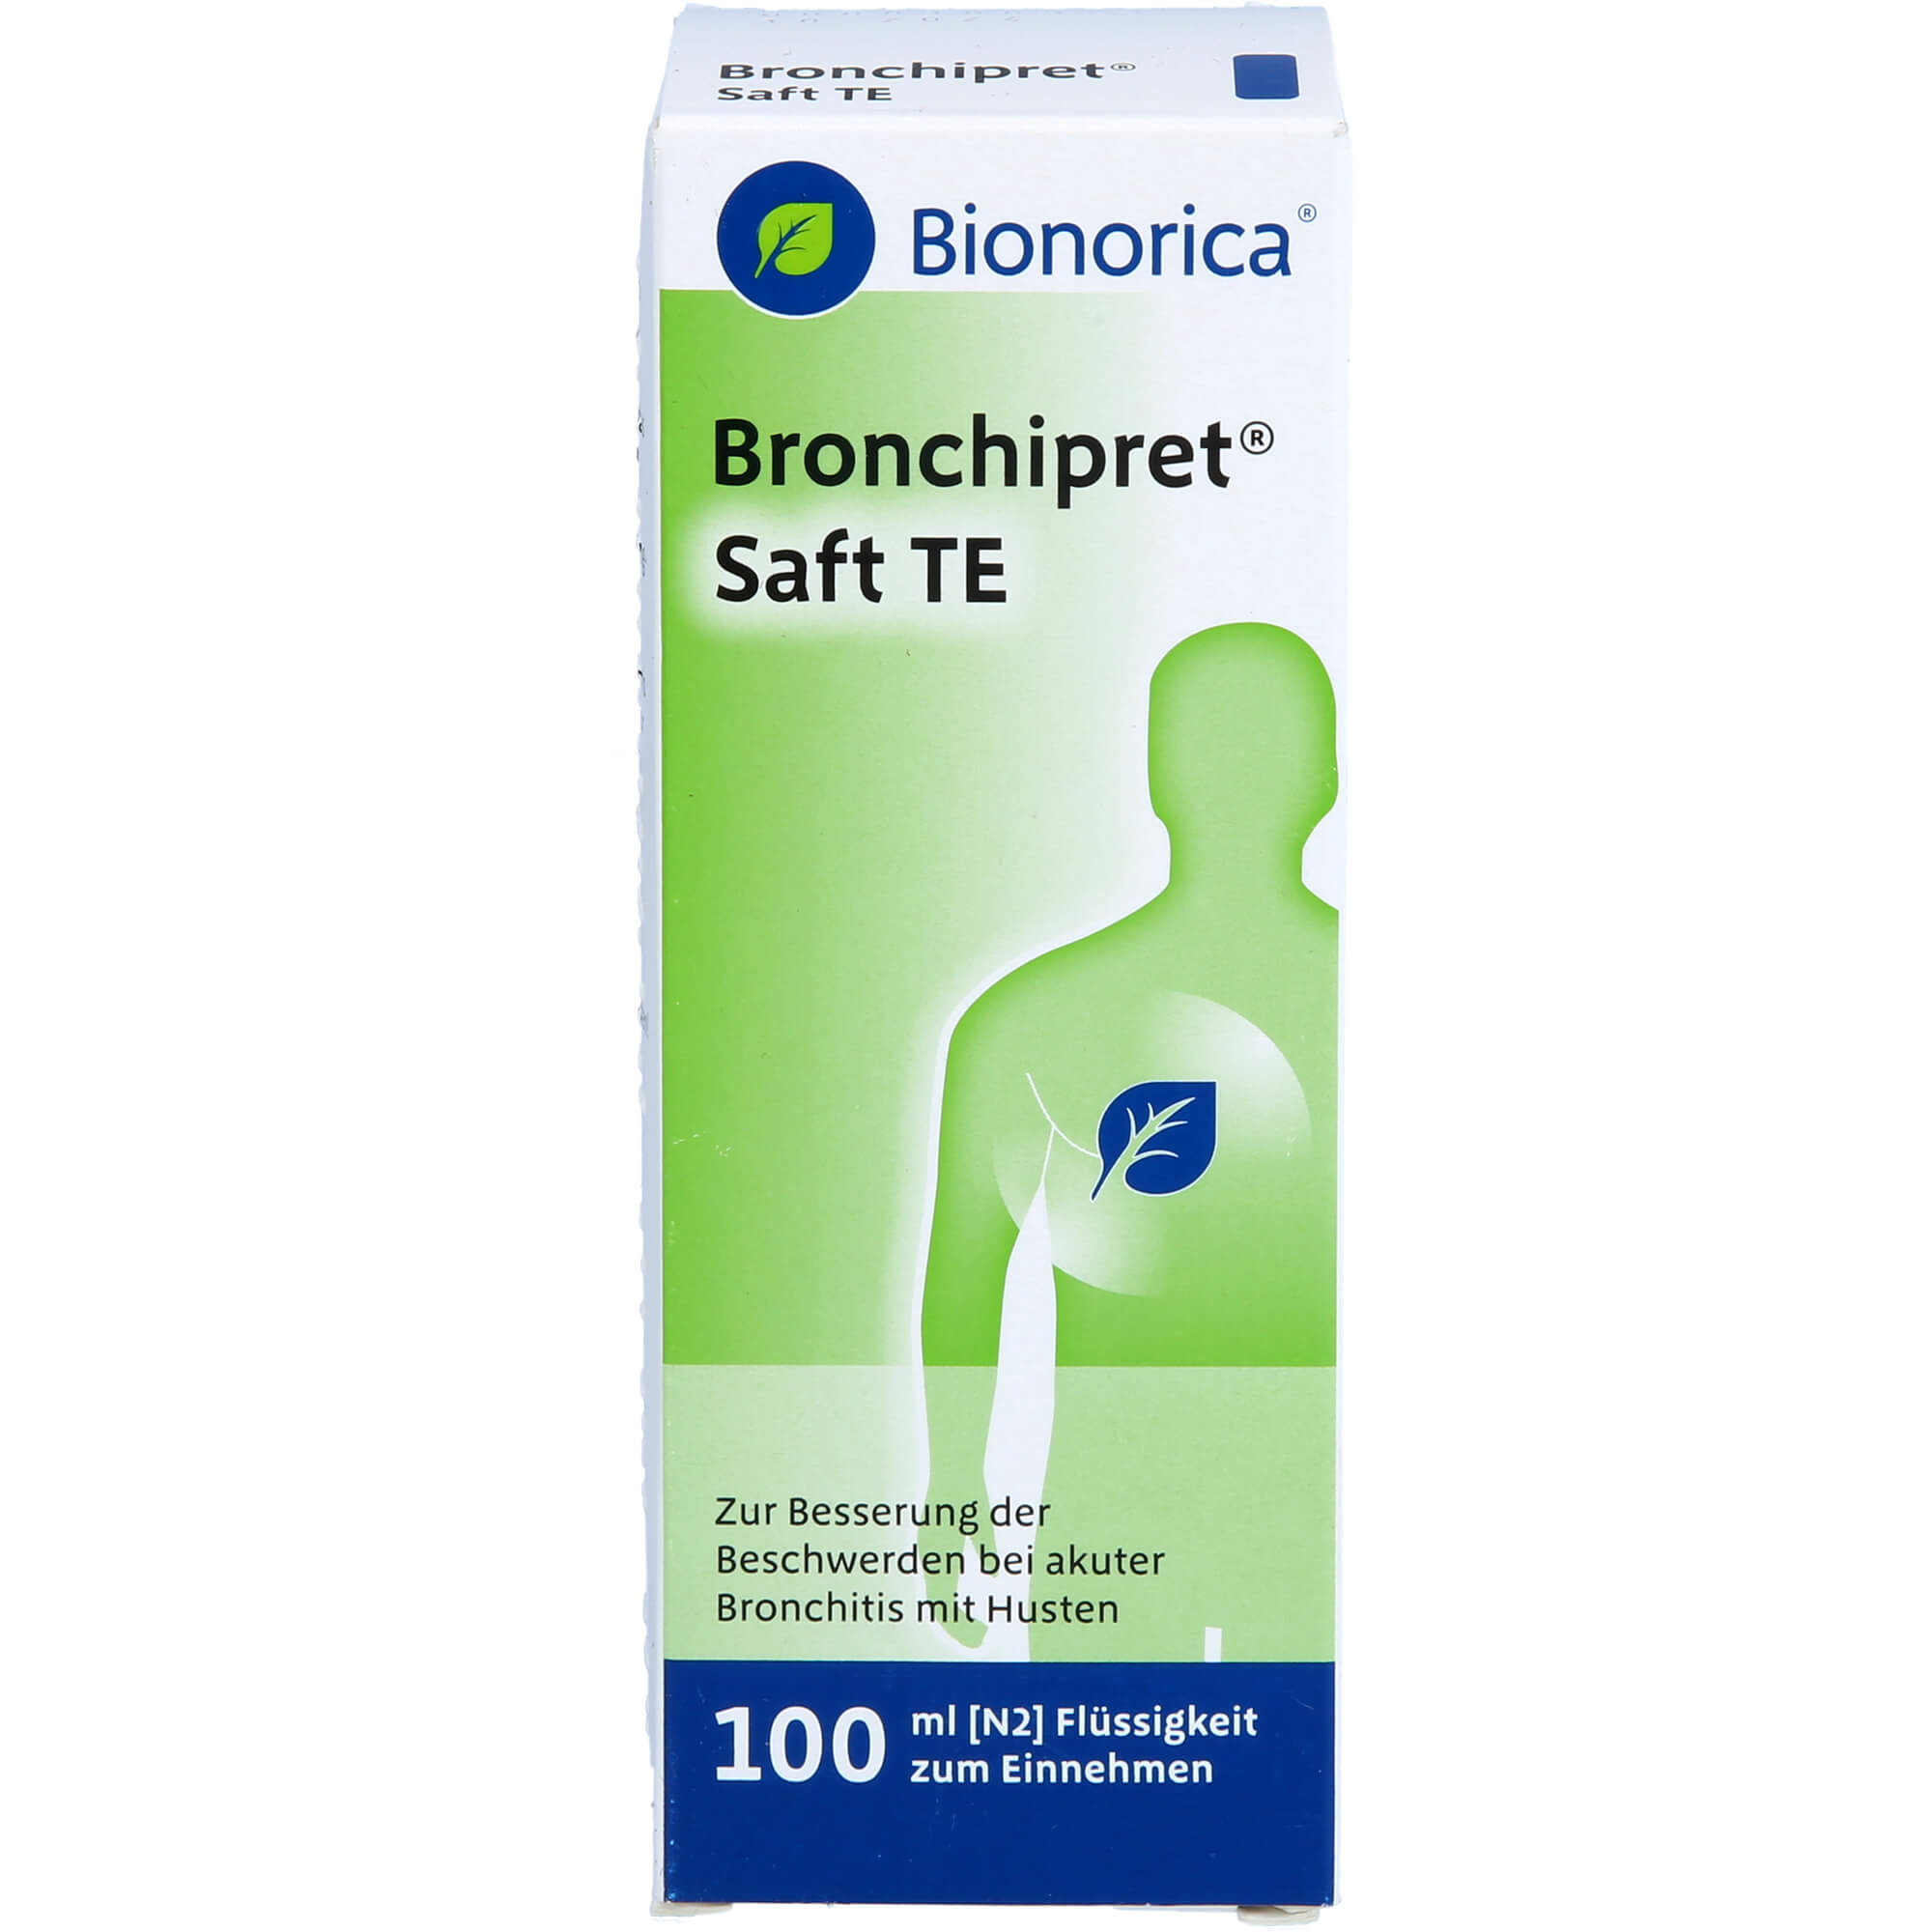 BRONCHIPRET-Saft-TE